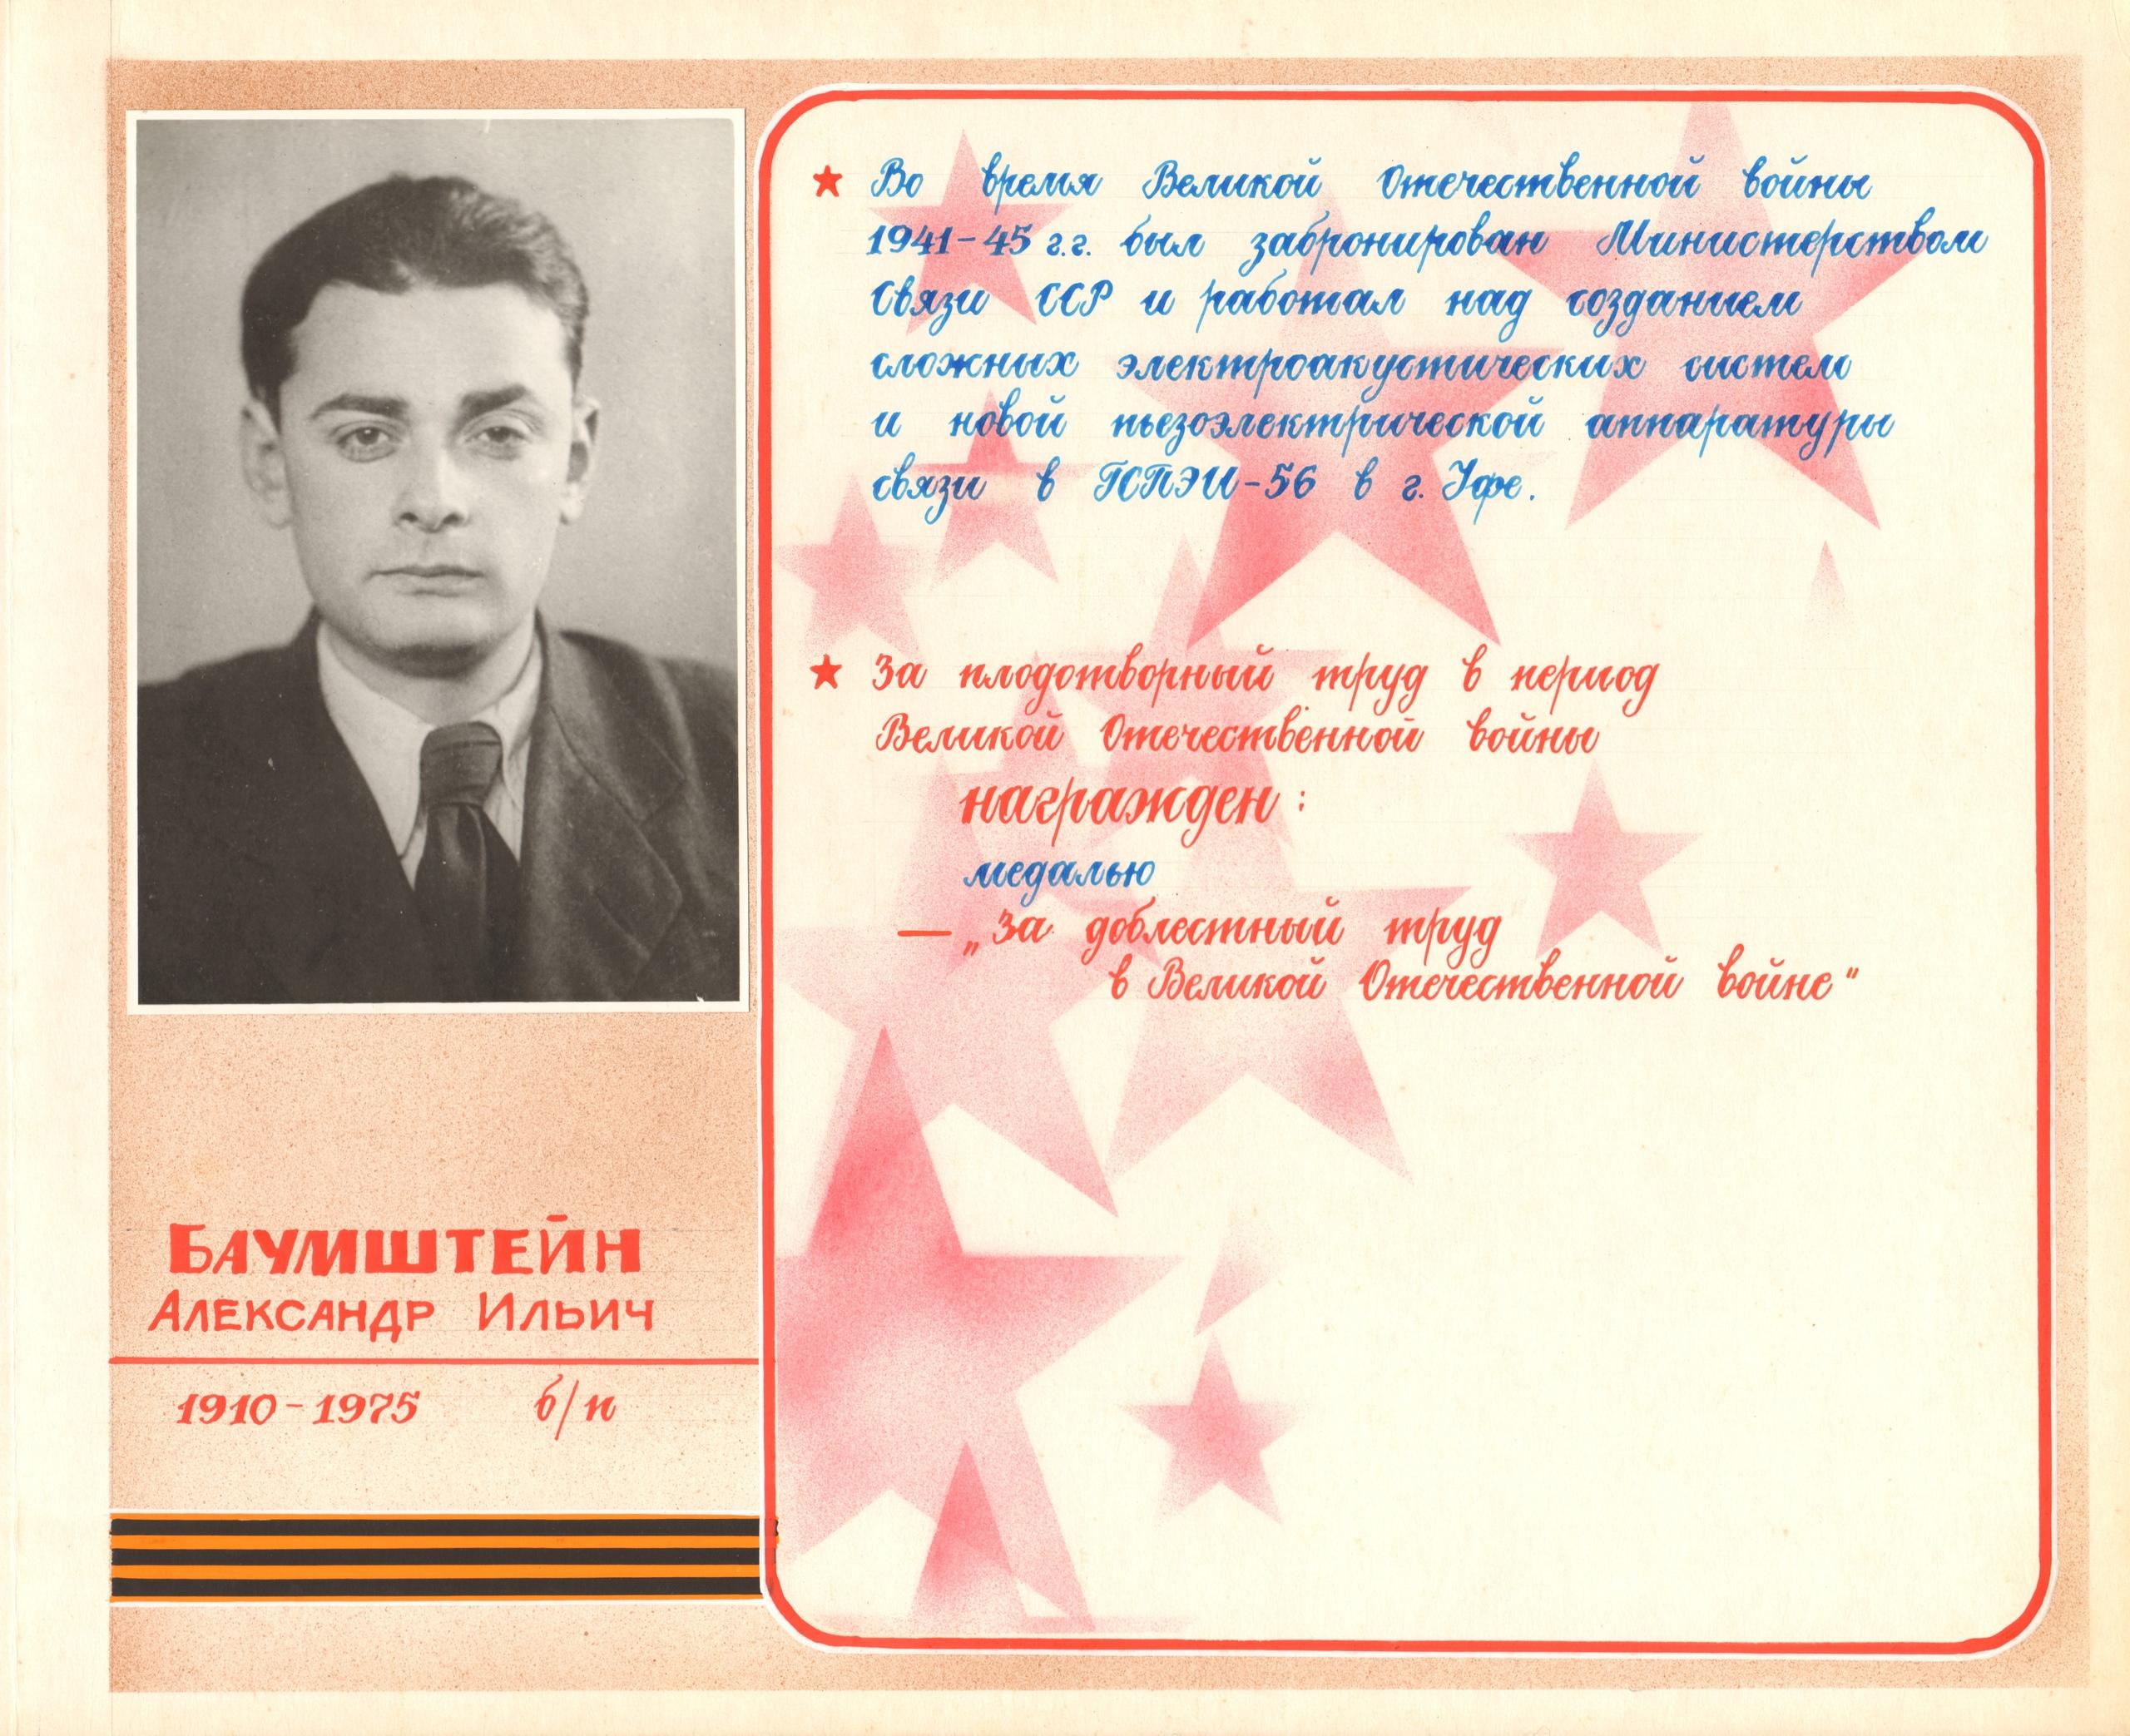 Баумштейн Александр Ильич